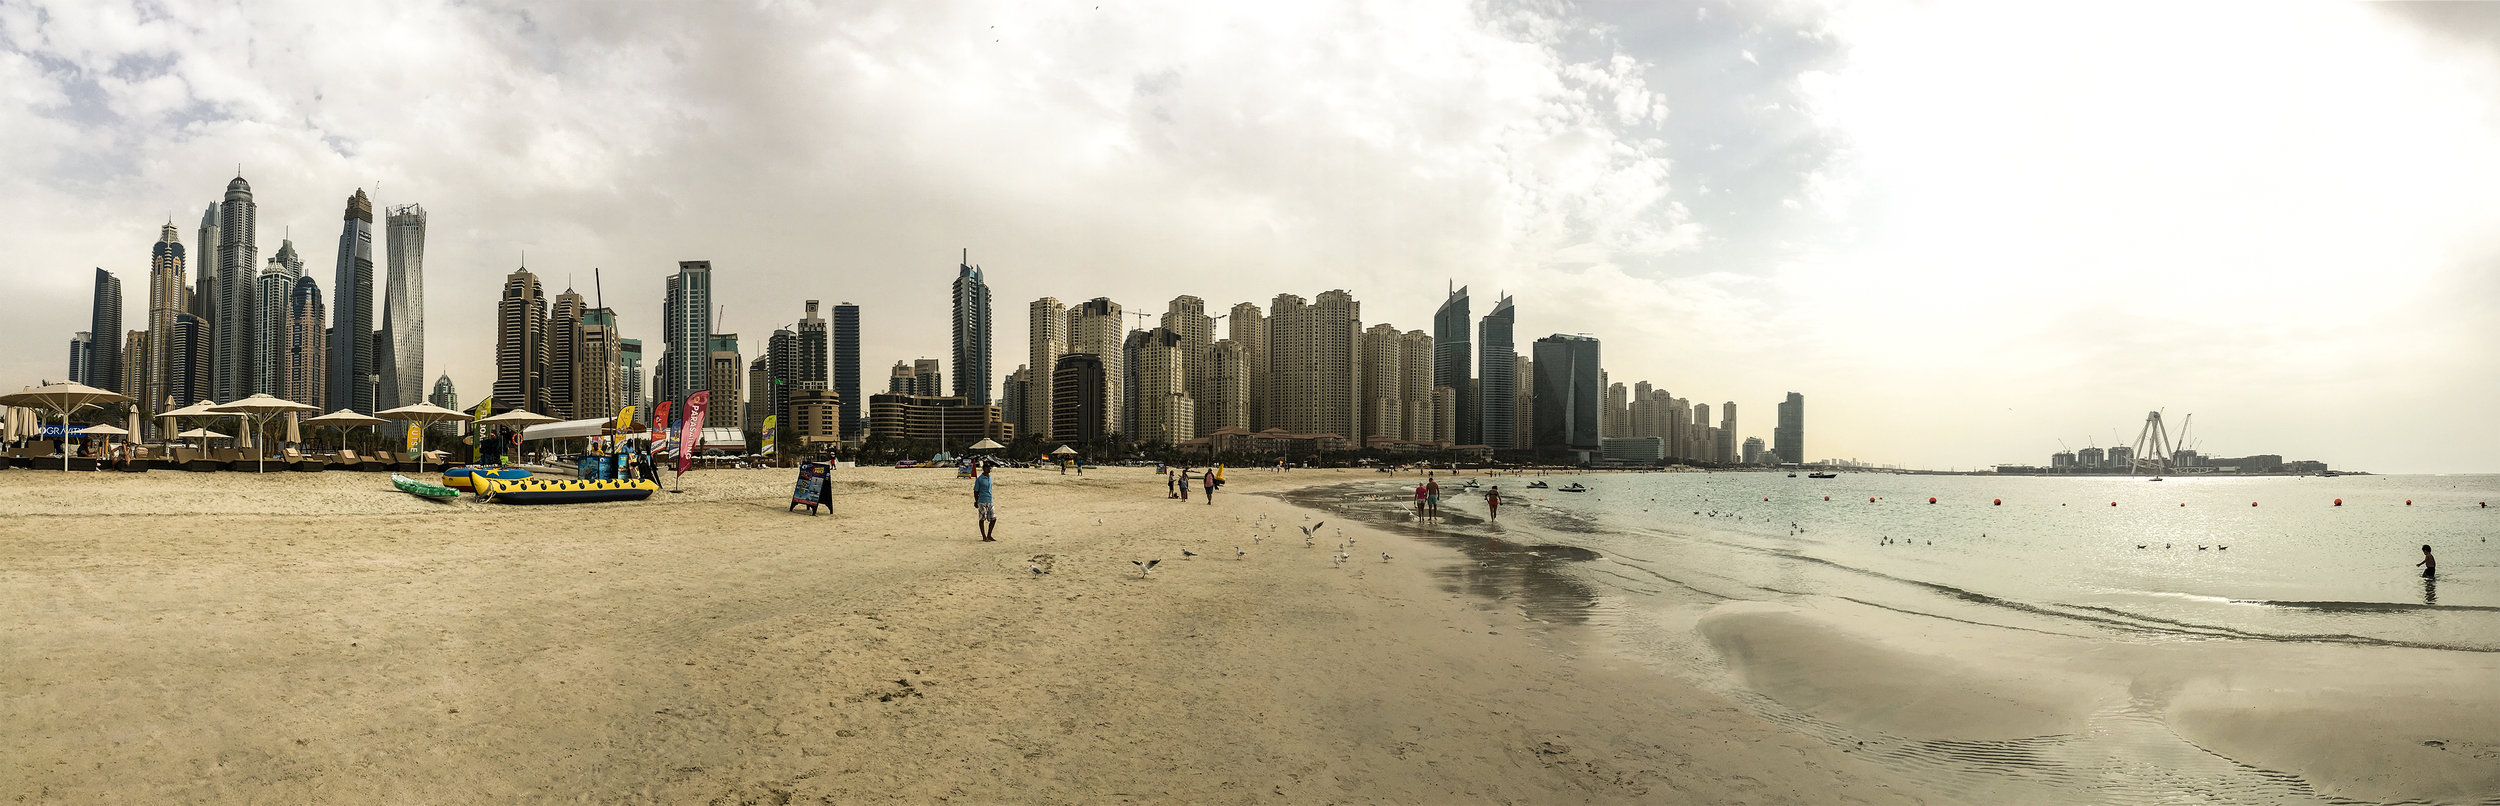 The Dubai cityscape